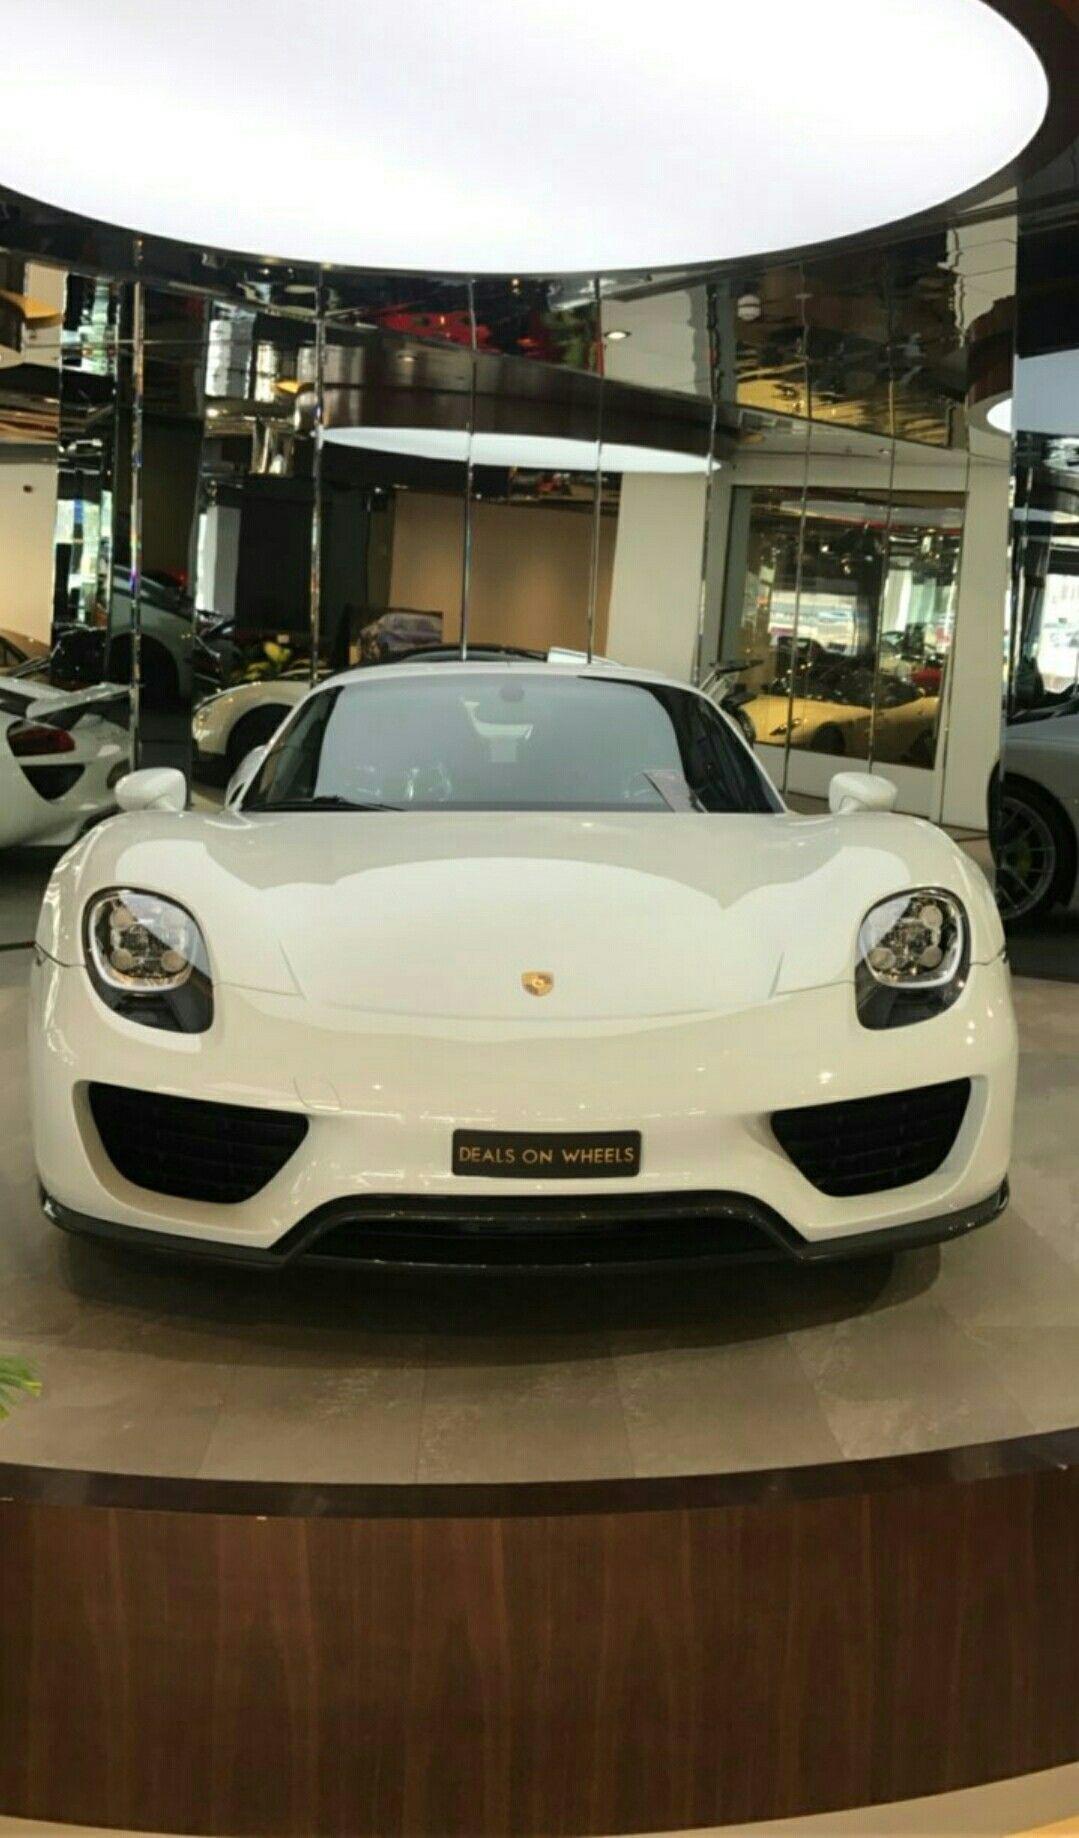 576de42a7ddf837790f64dc3e2a4e6f1 Mesmerizing Porsche 918 Spyder London Ontario Cars Trend